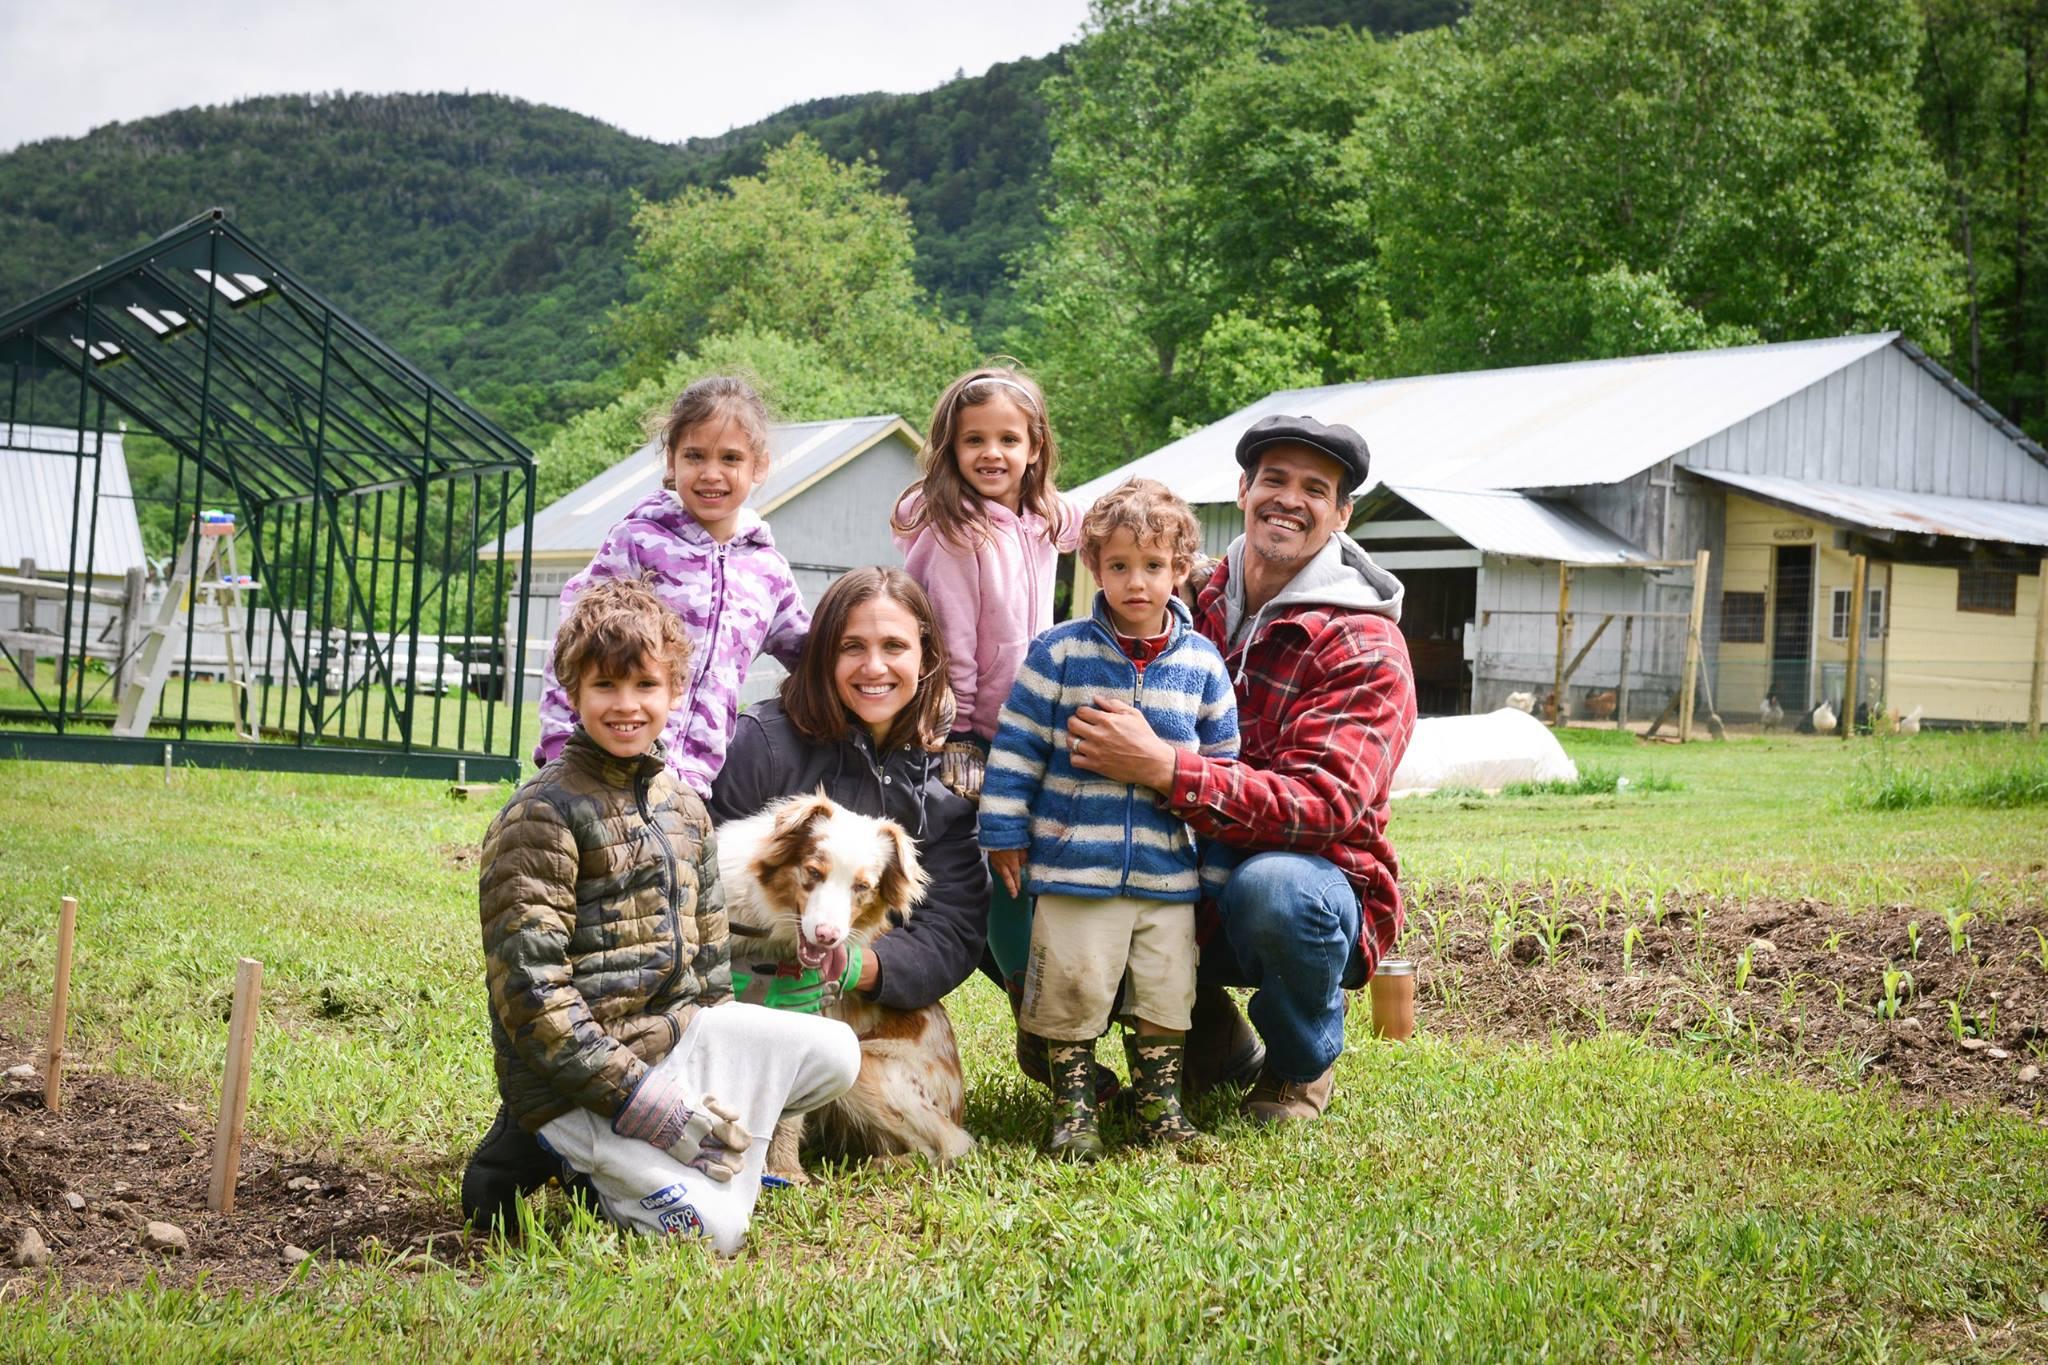 The Harris Family of Shangra La Farm, Starksboro, Vermont